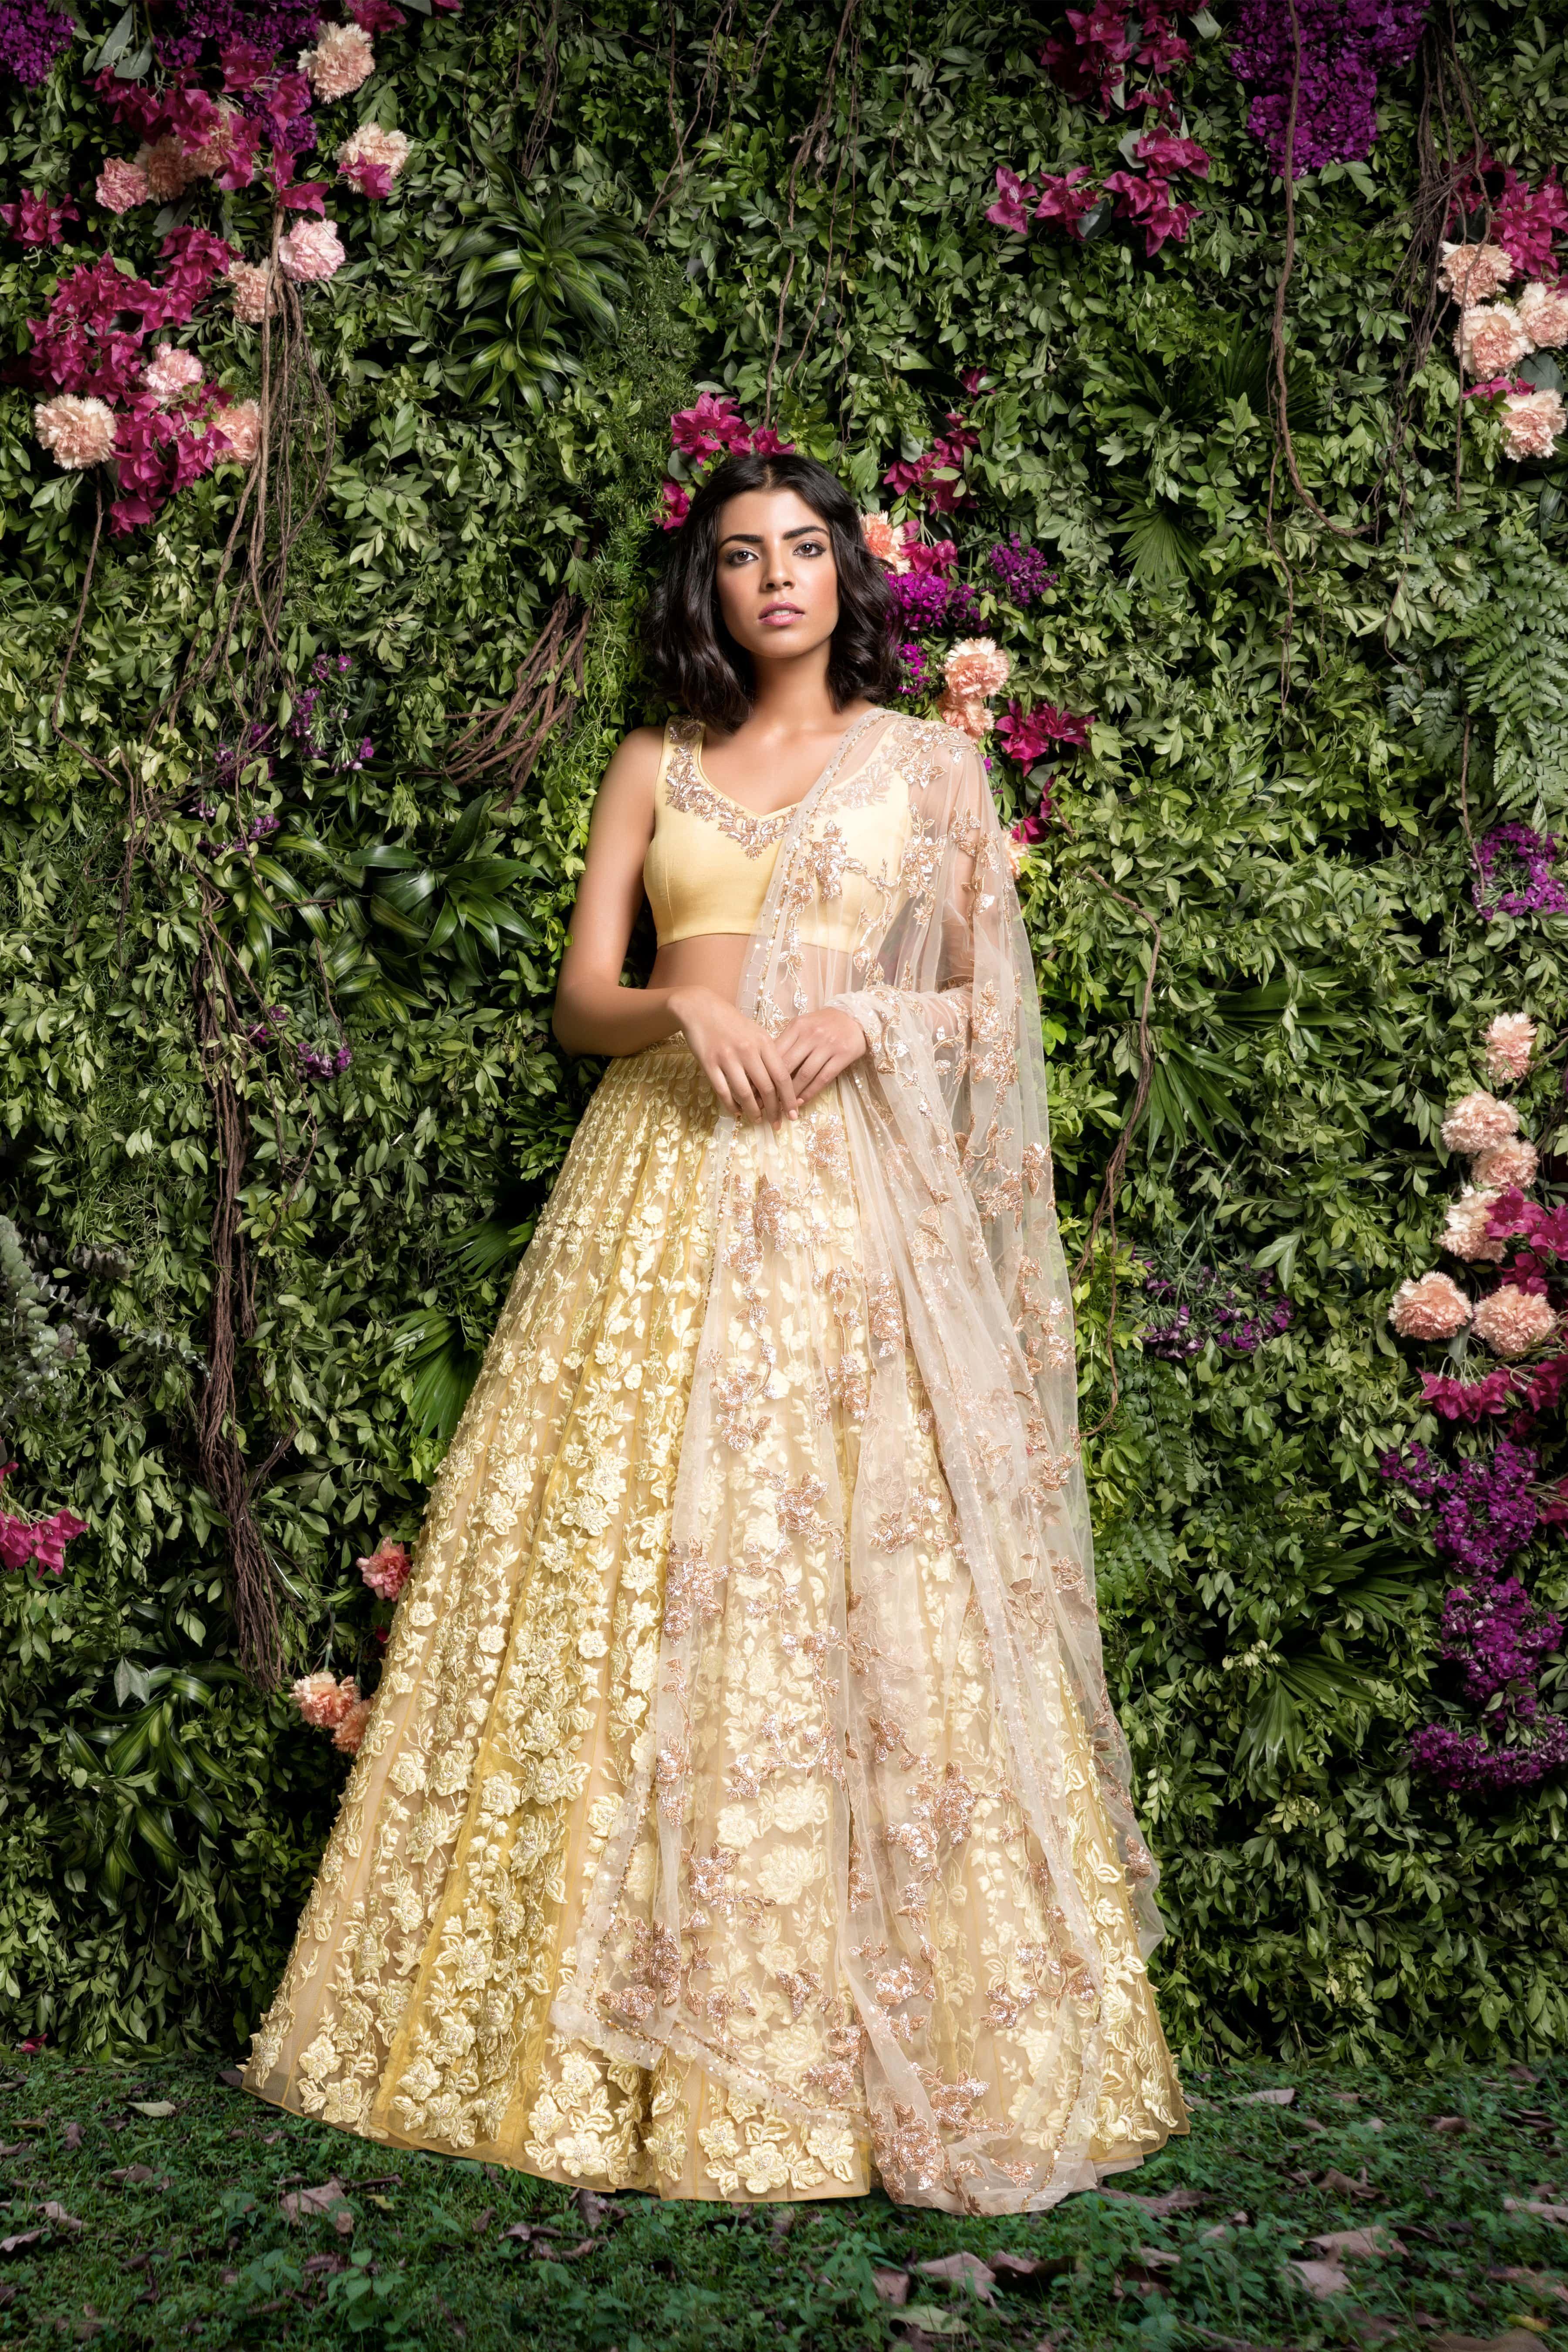 Pin von Sandhya Hariharan auf Everything Tradition and Elegant ...